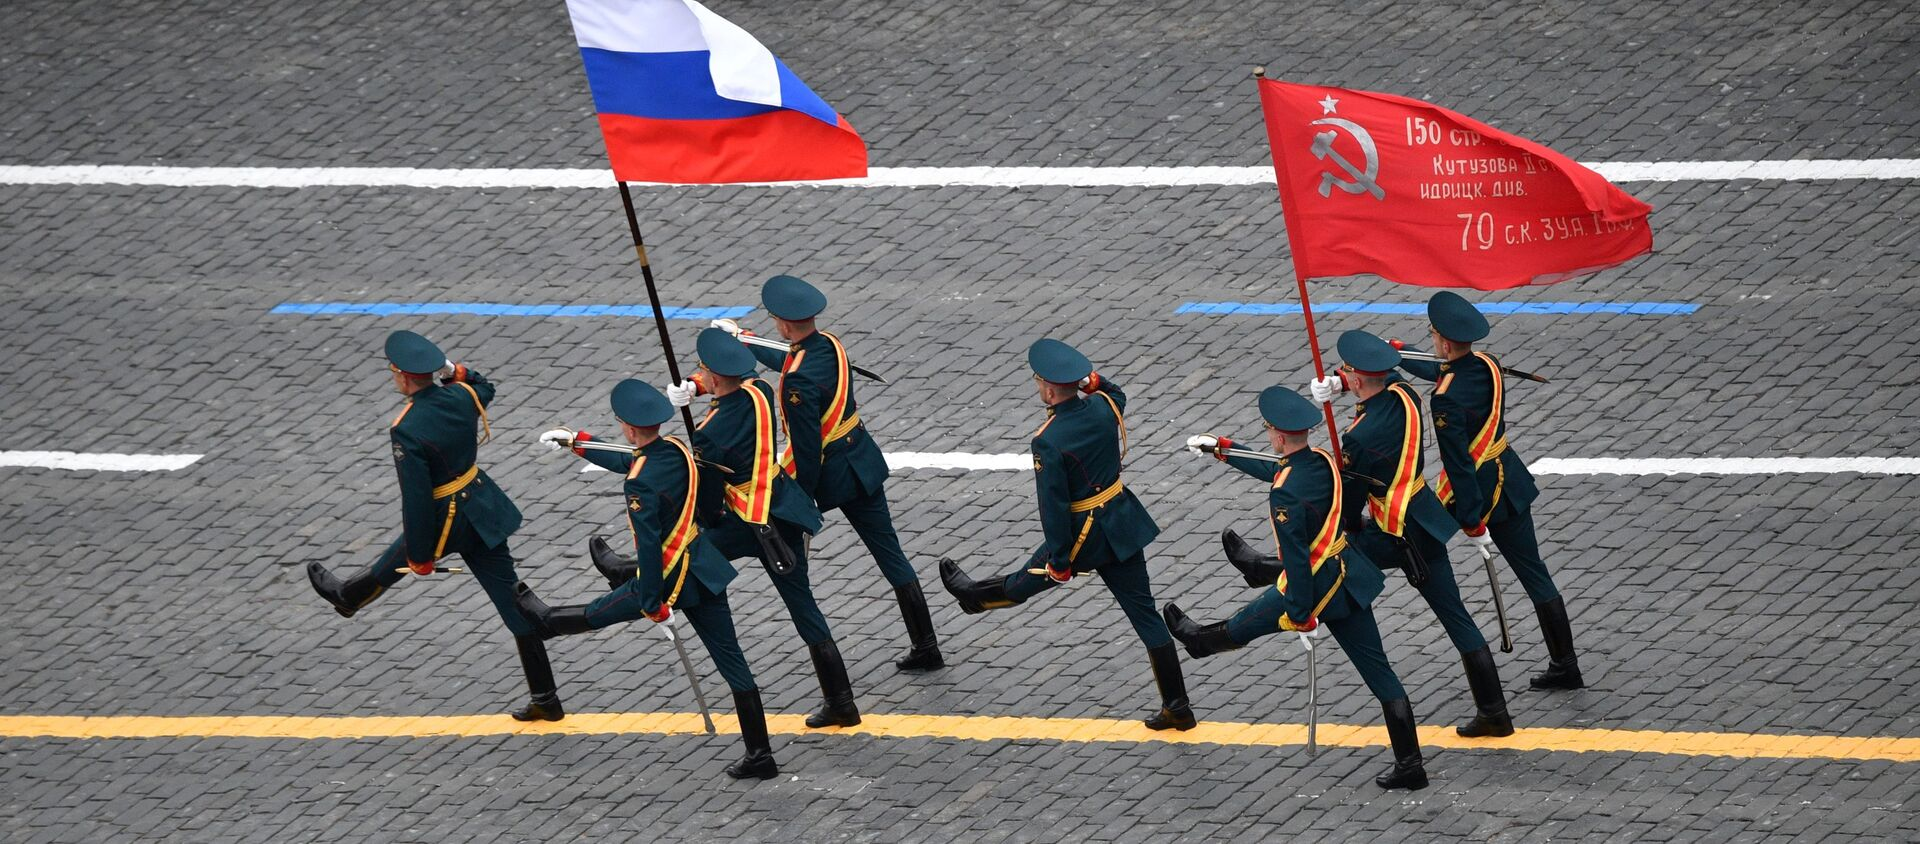 Parata militare a Mosca - Sputnik Italia, 1920, 09.05.2021